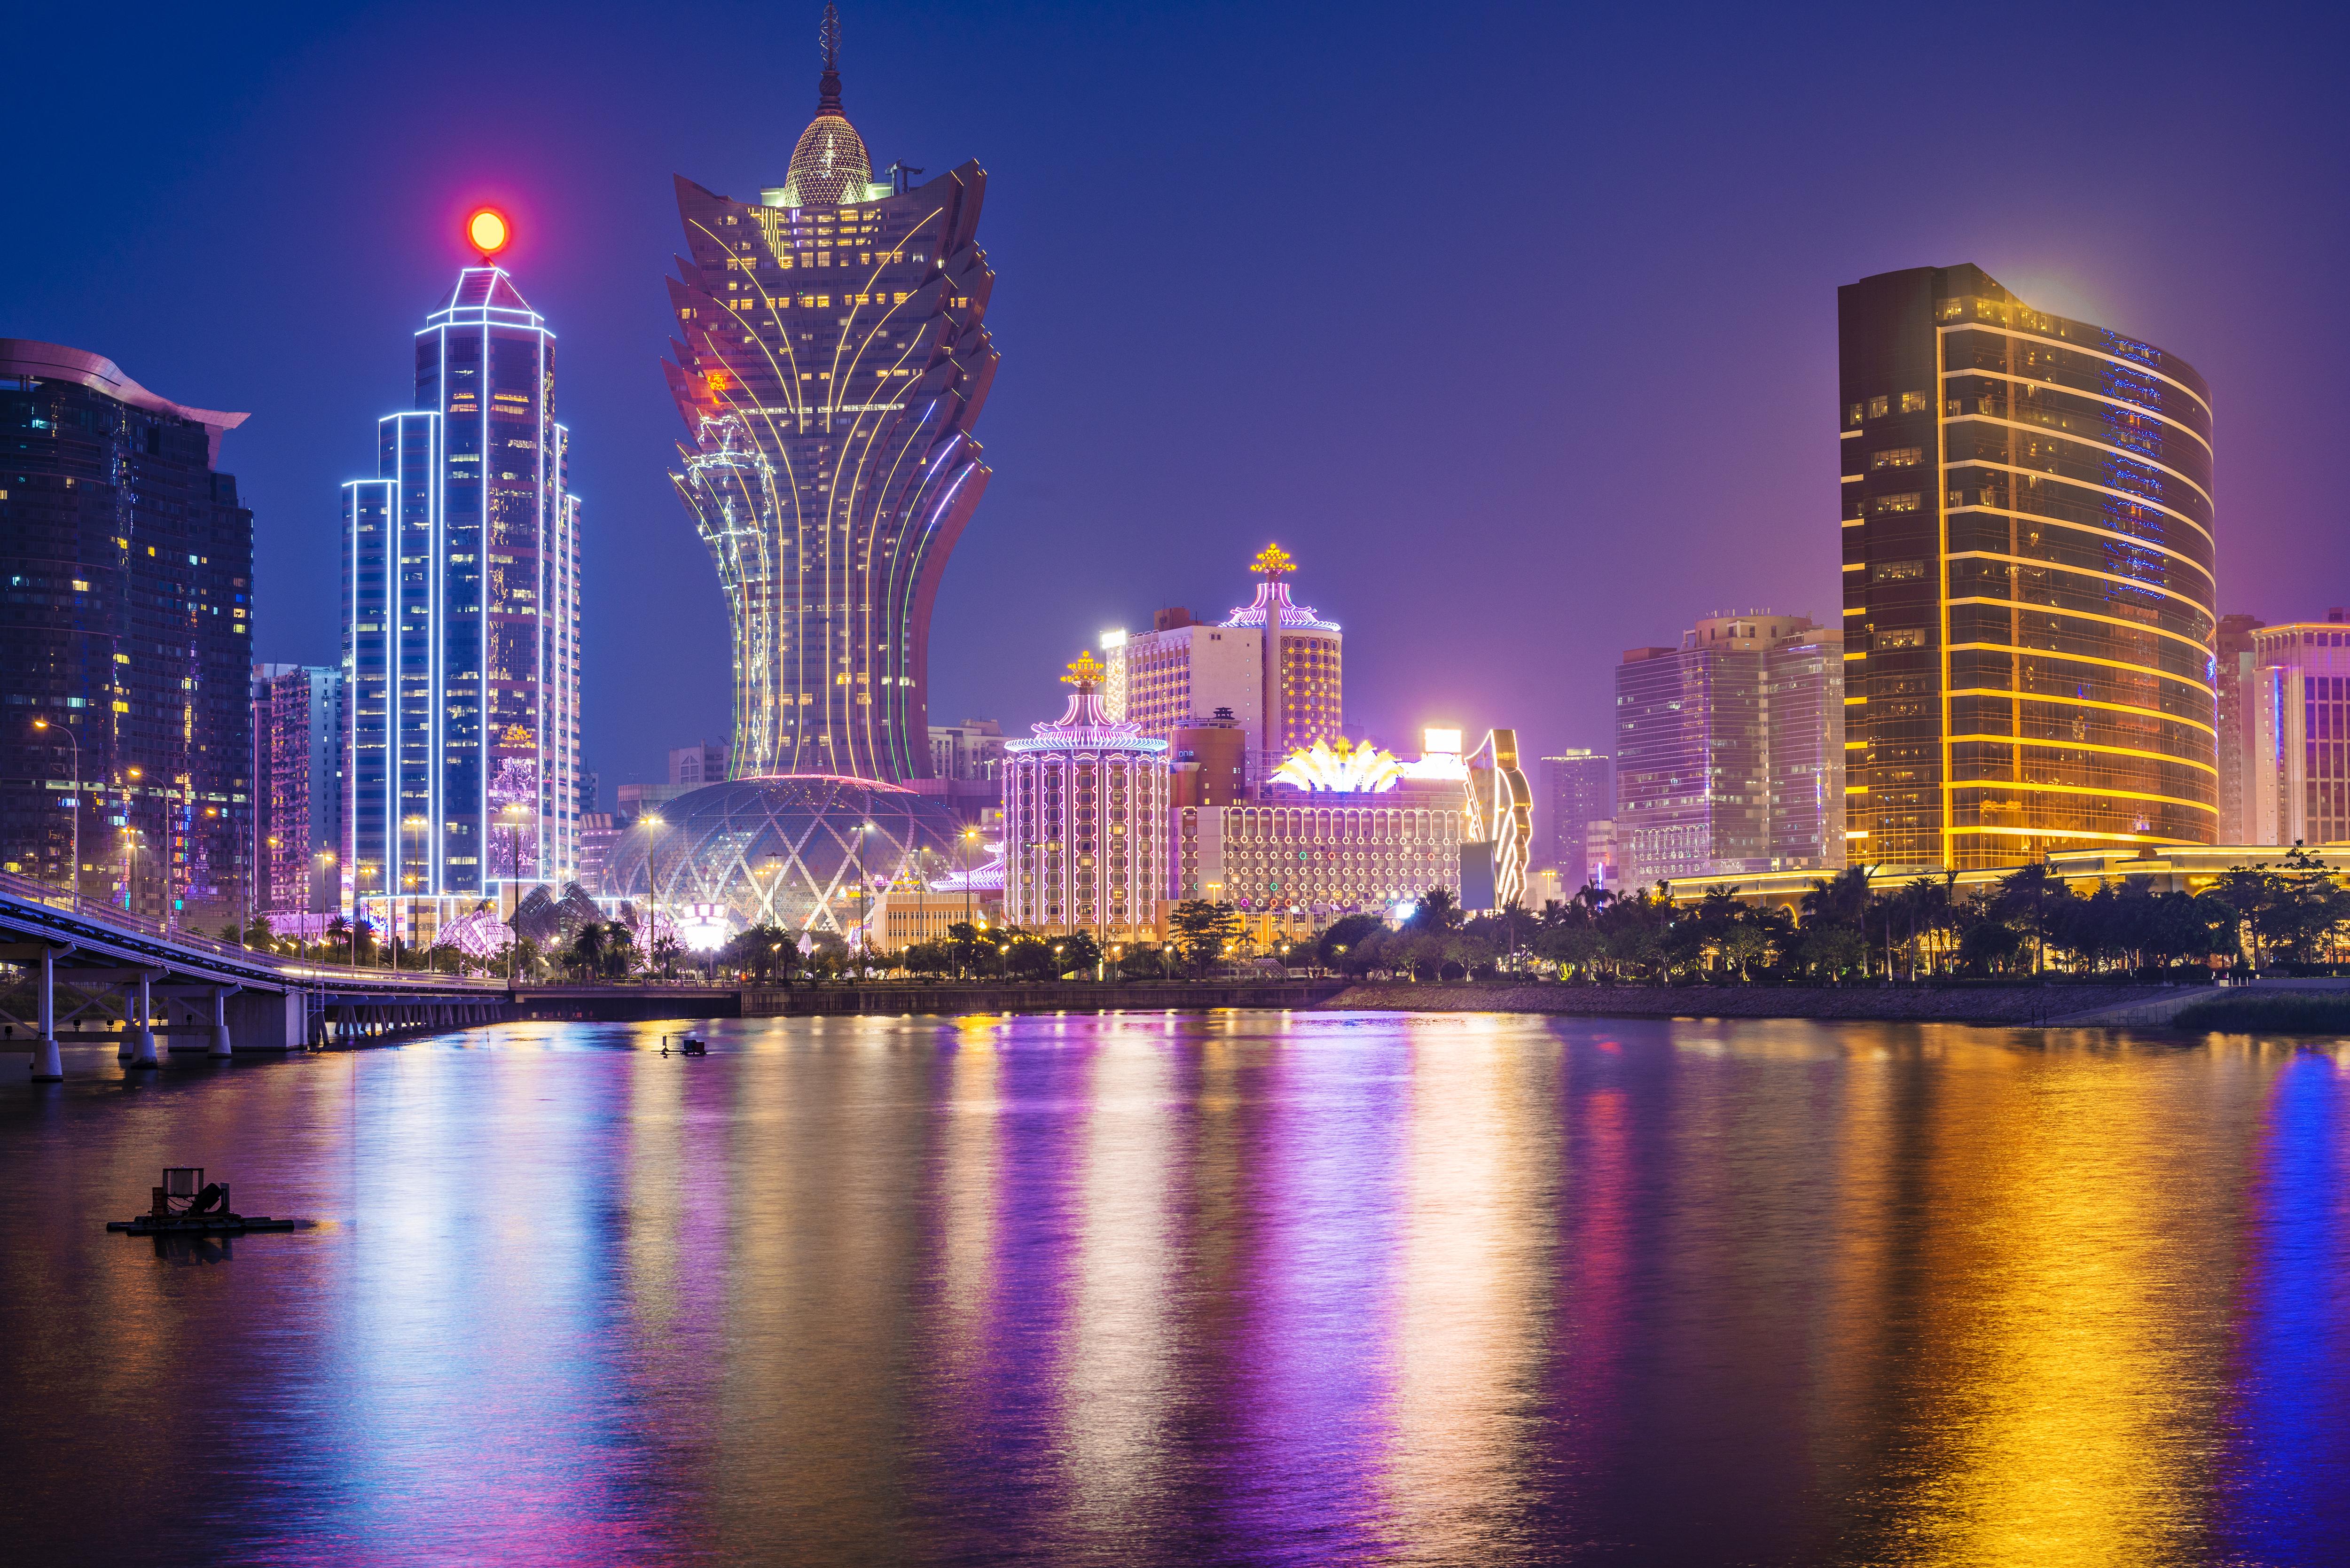 Macau's skyline at dusk.